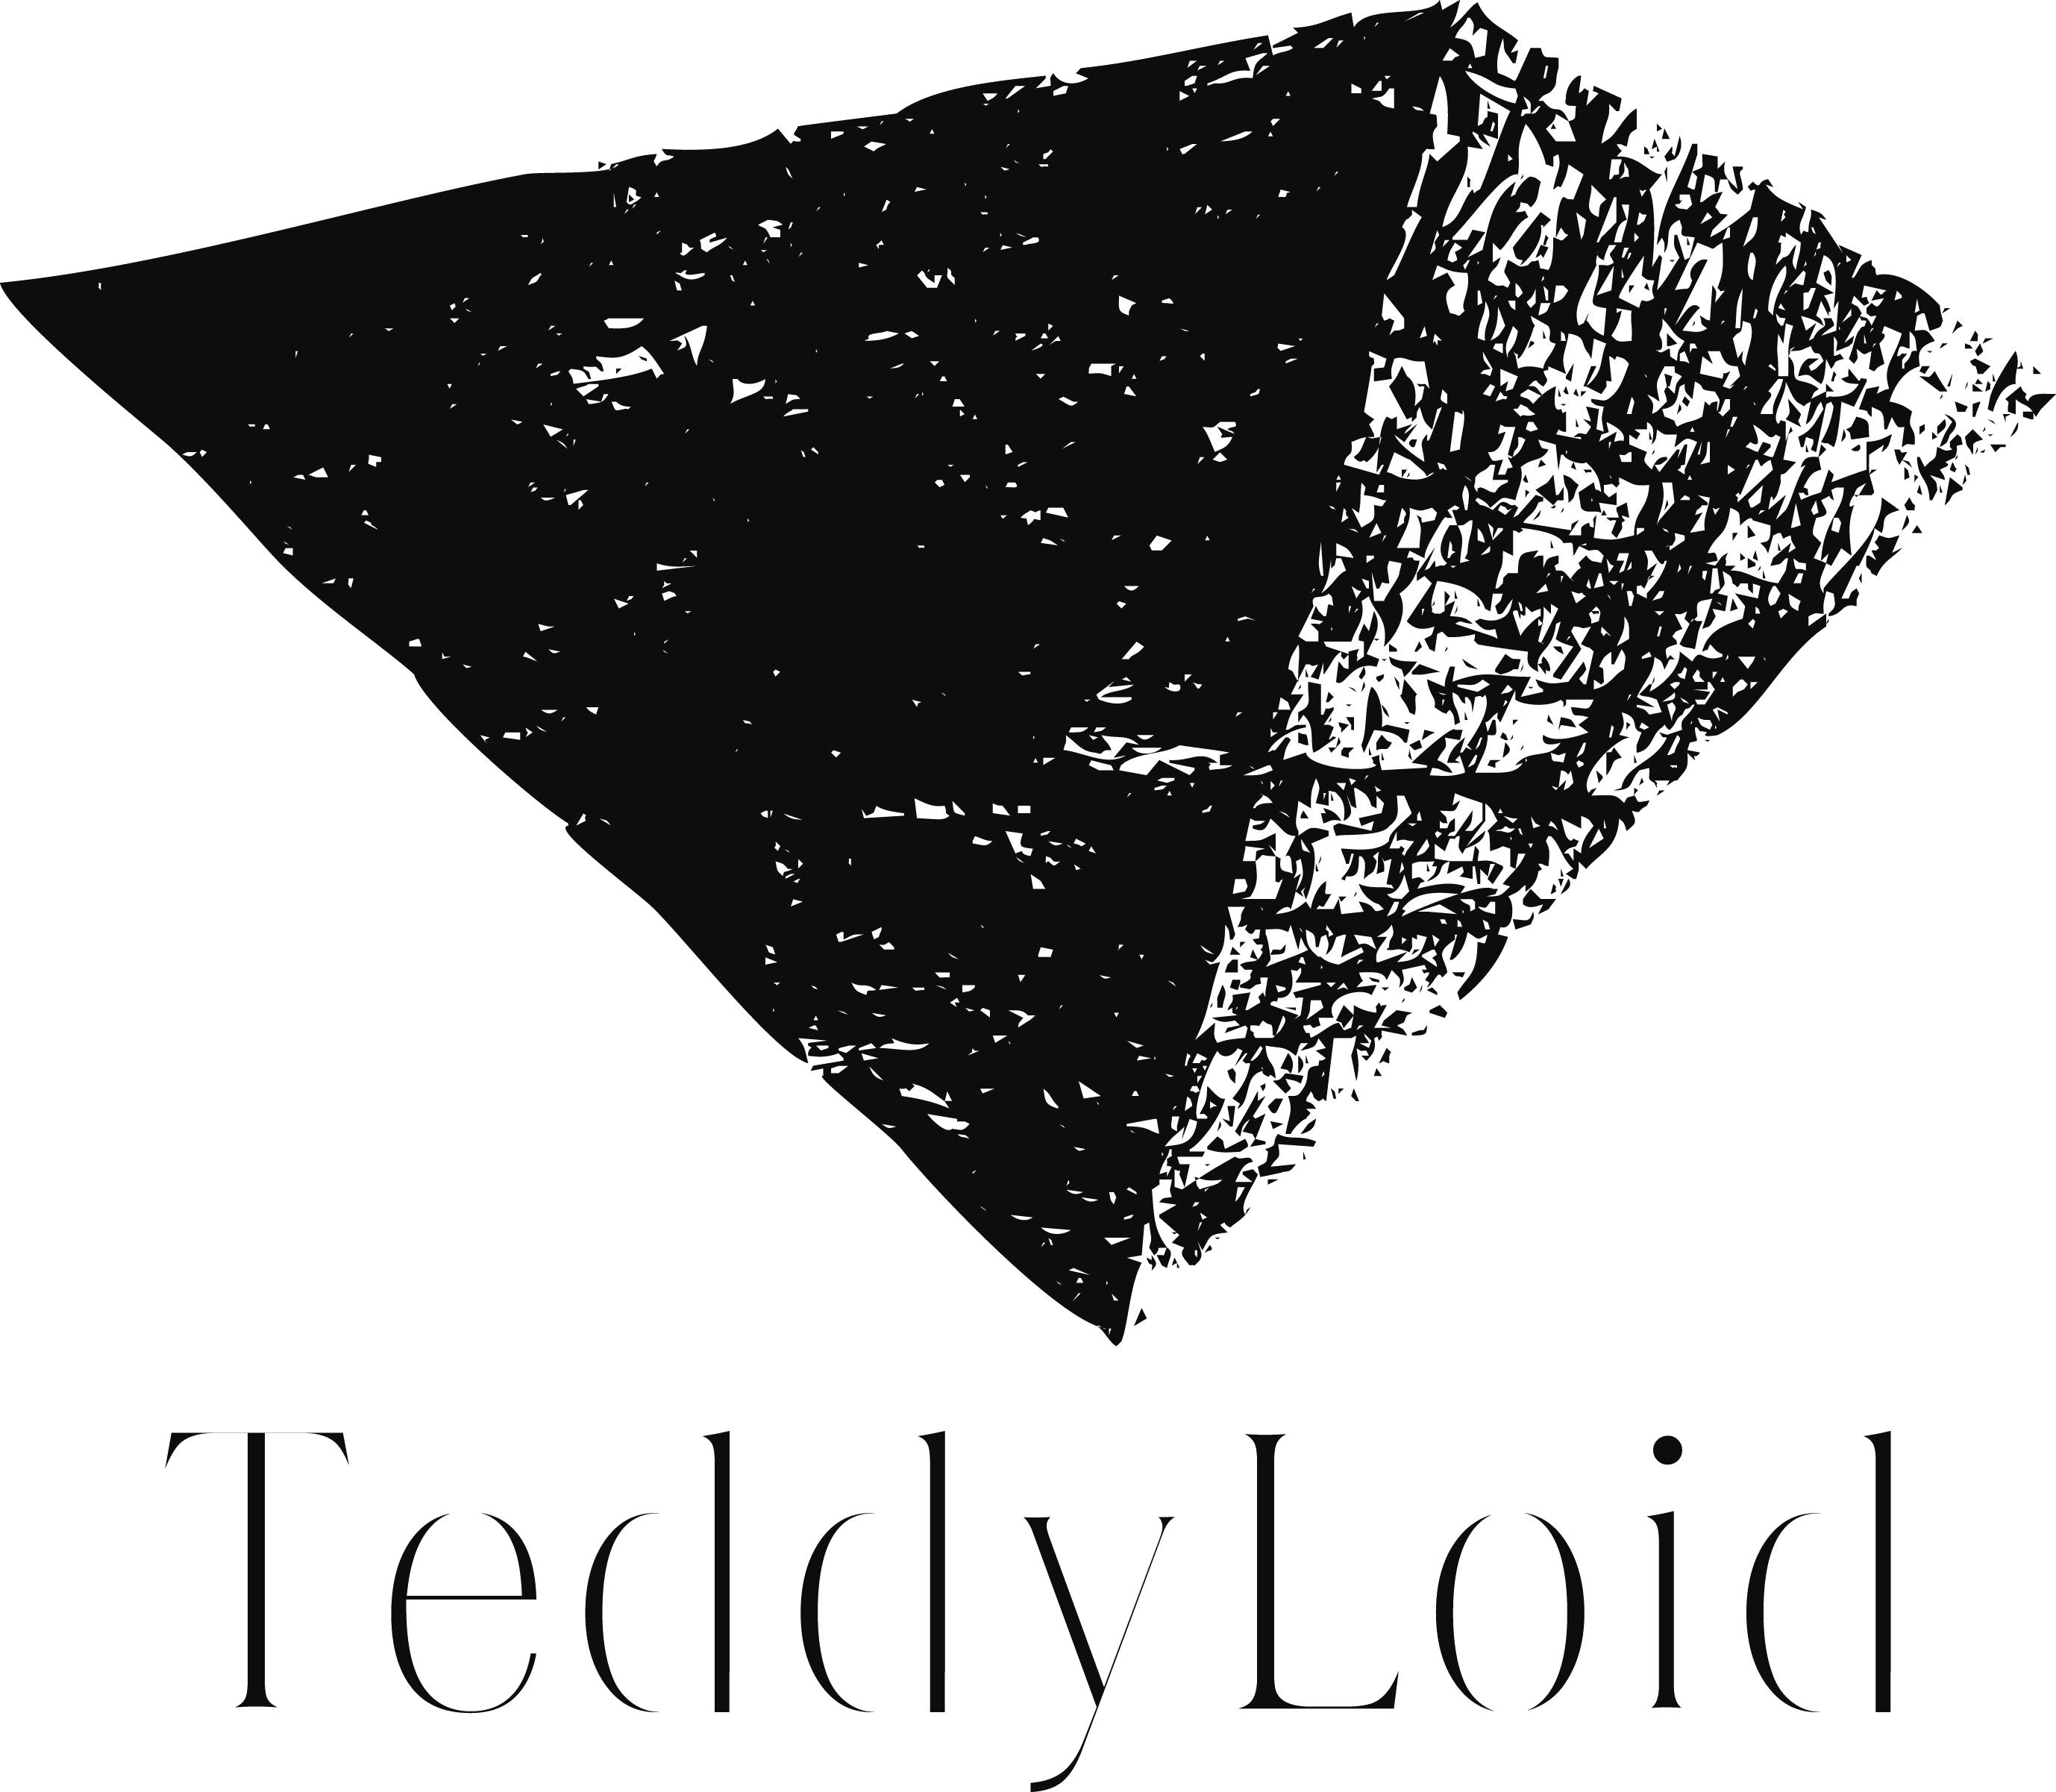 teddyloid logo